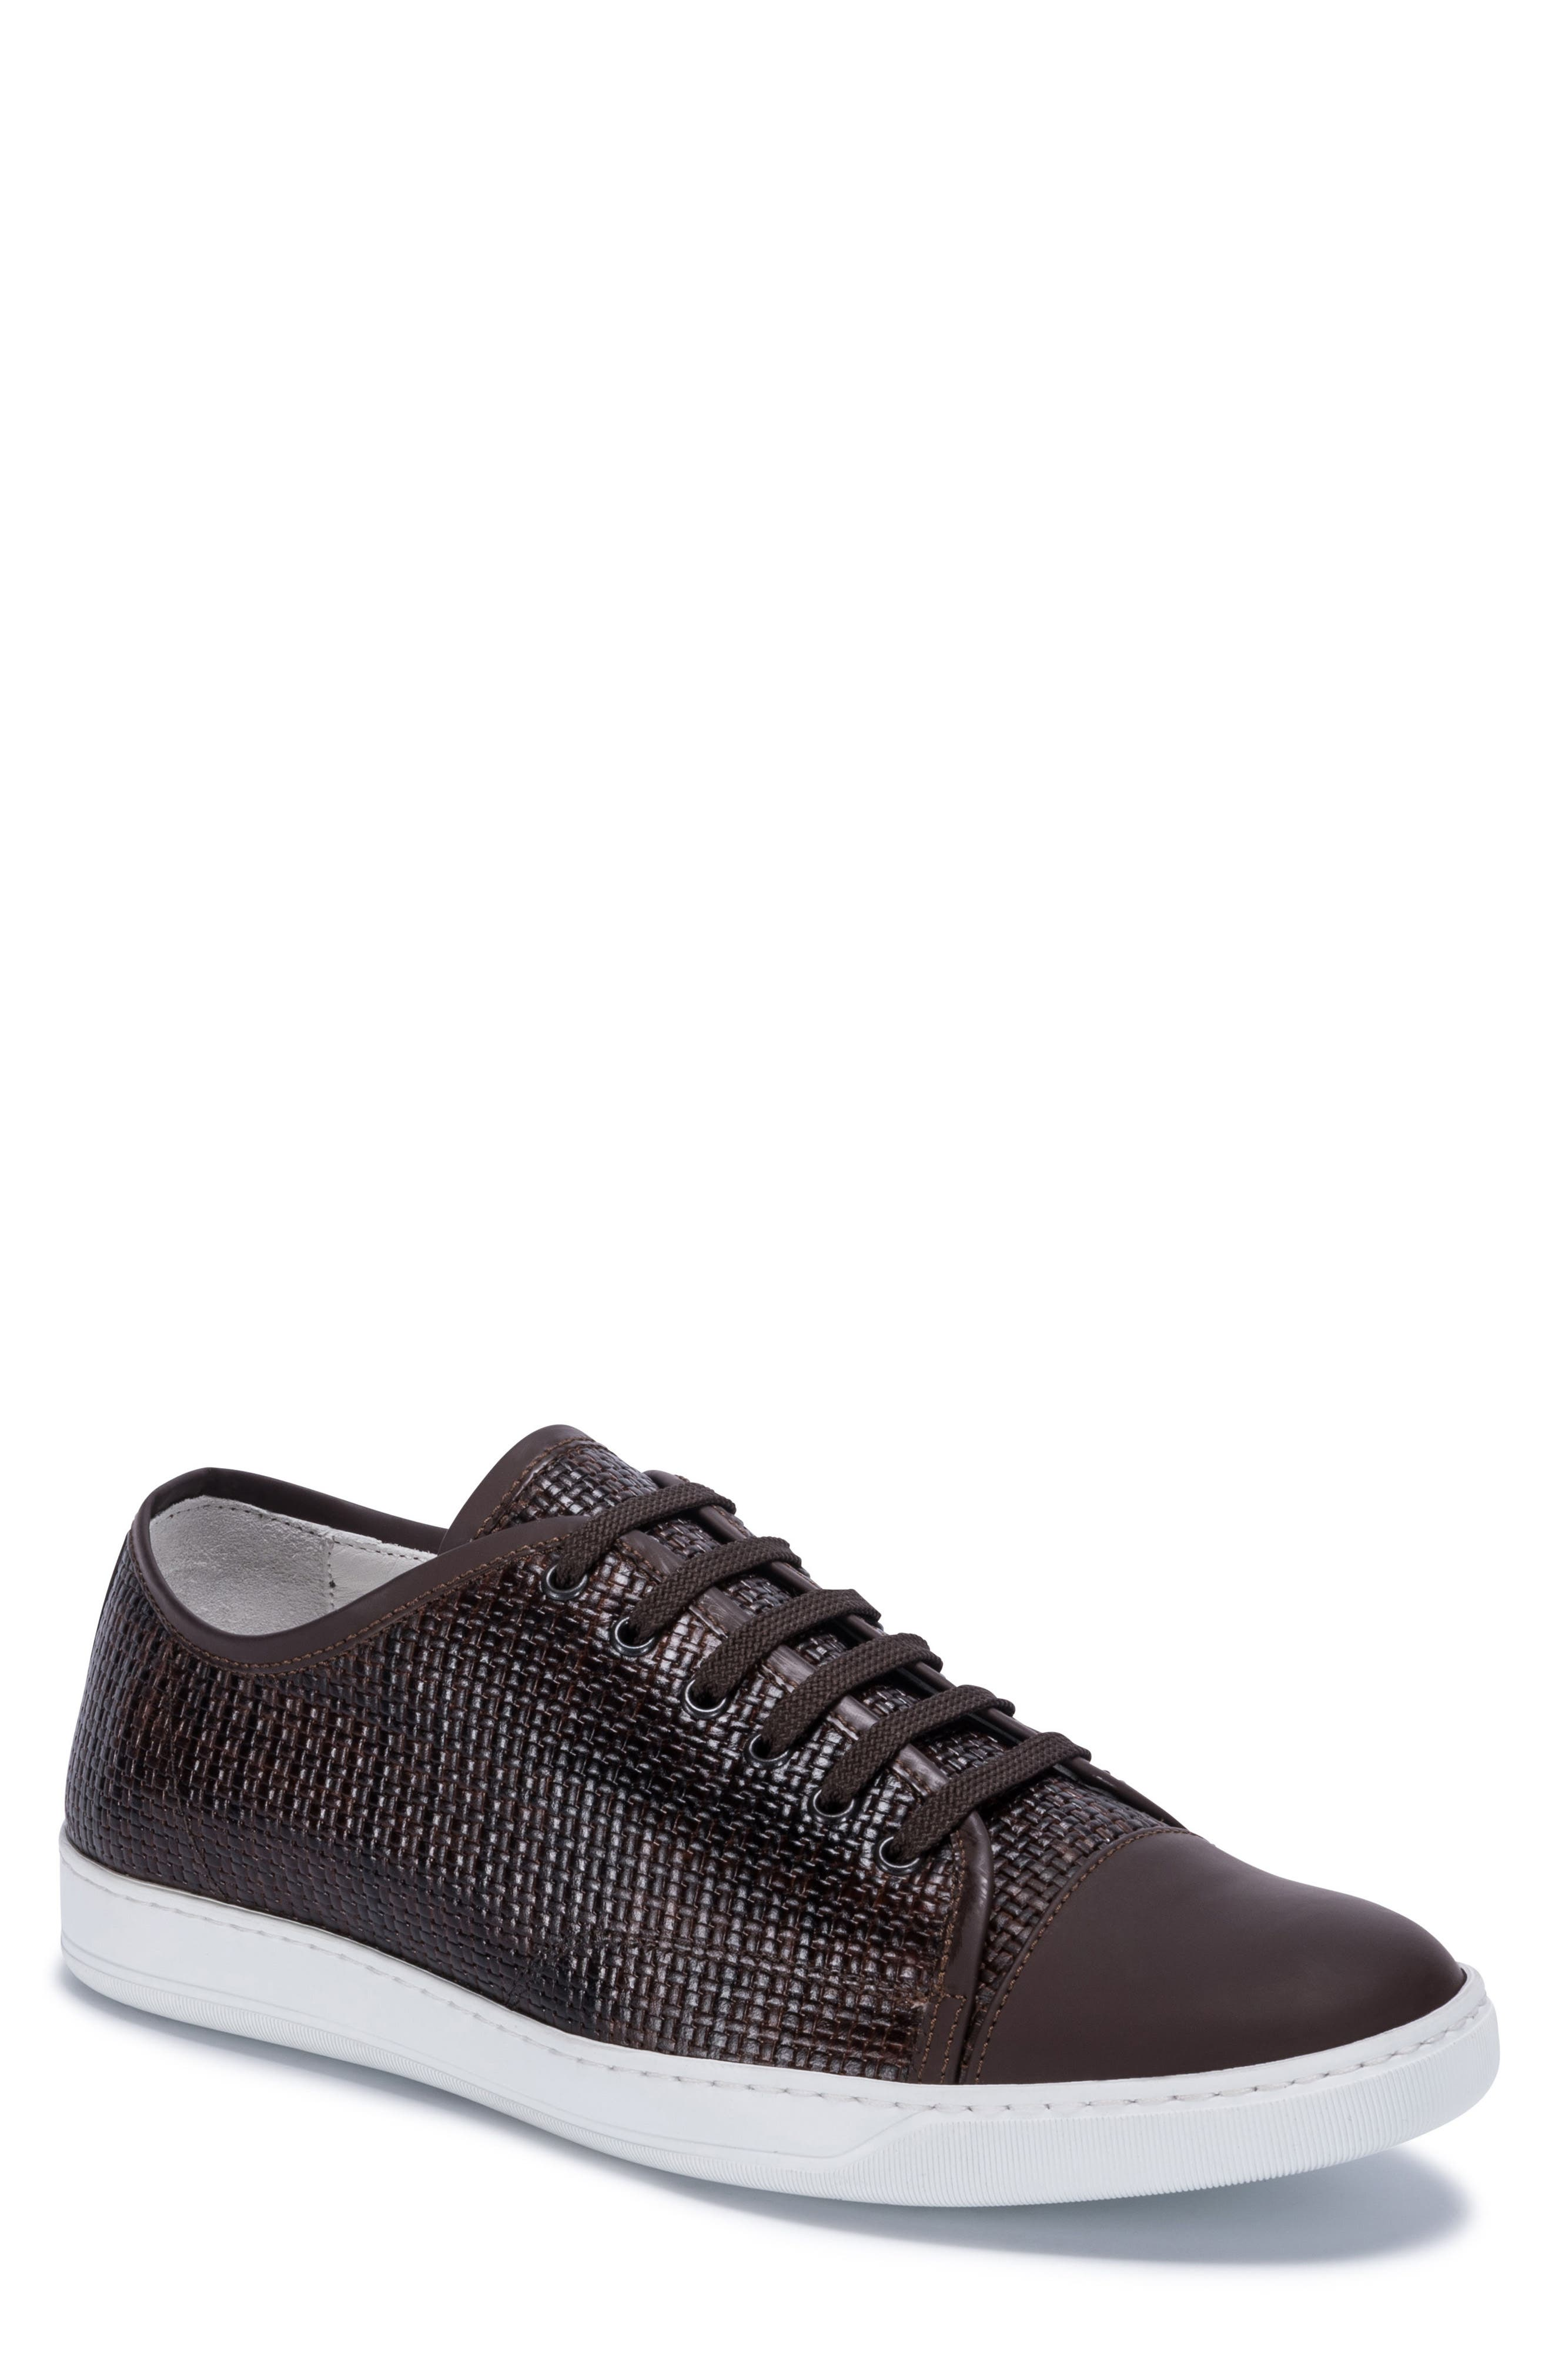 Cinque Terre Woven Cap Toe Sneaker,                             Main thumbnail 1, color,                             Brown Leather